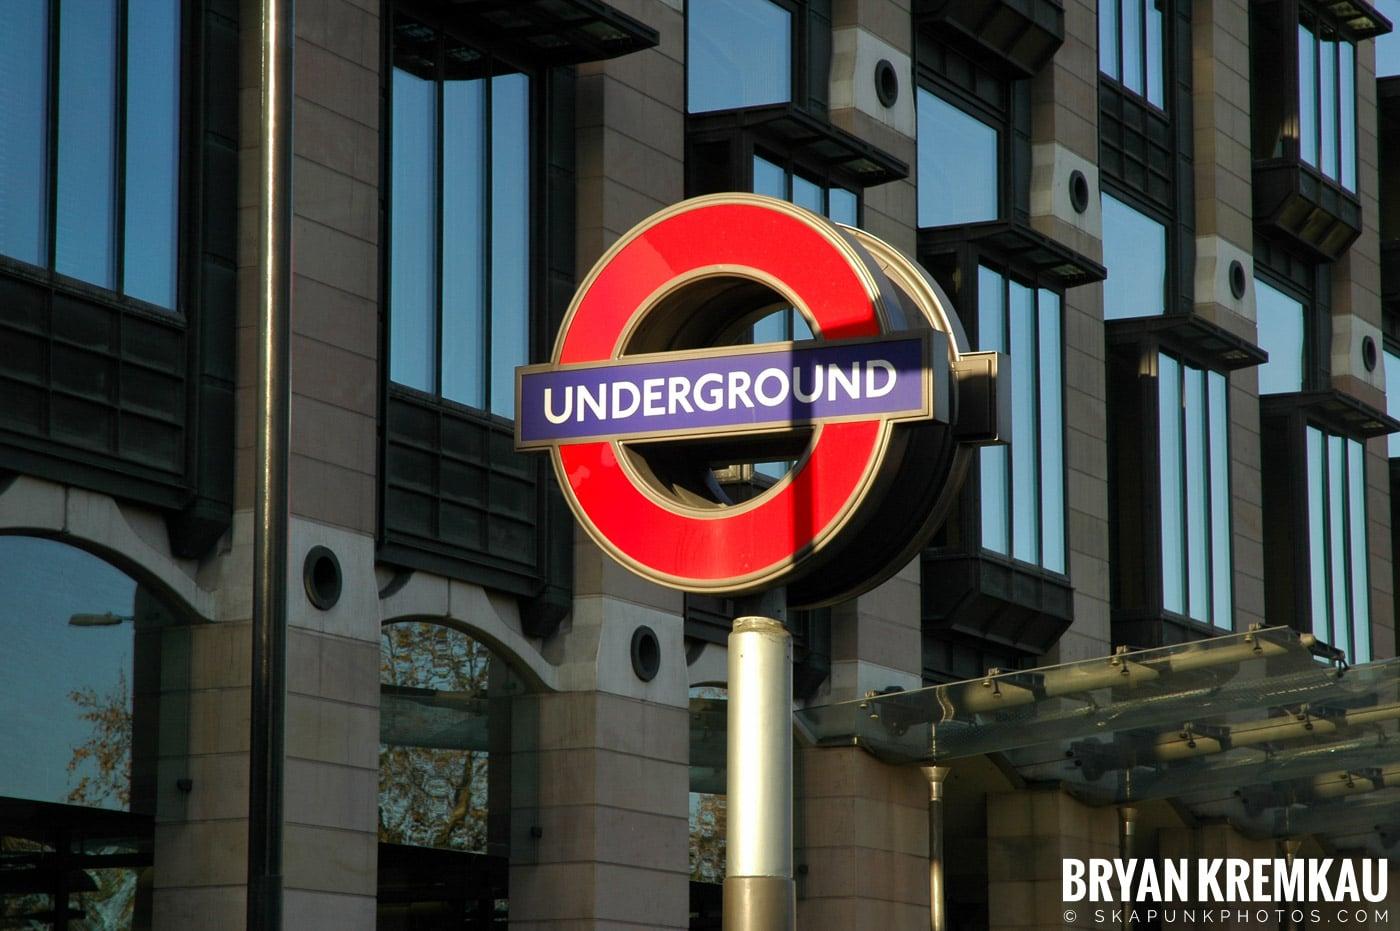 London, England - Day 4 - 12.19.05 (25)